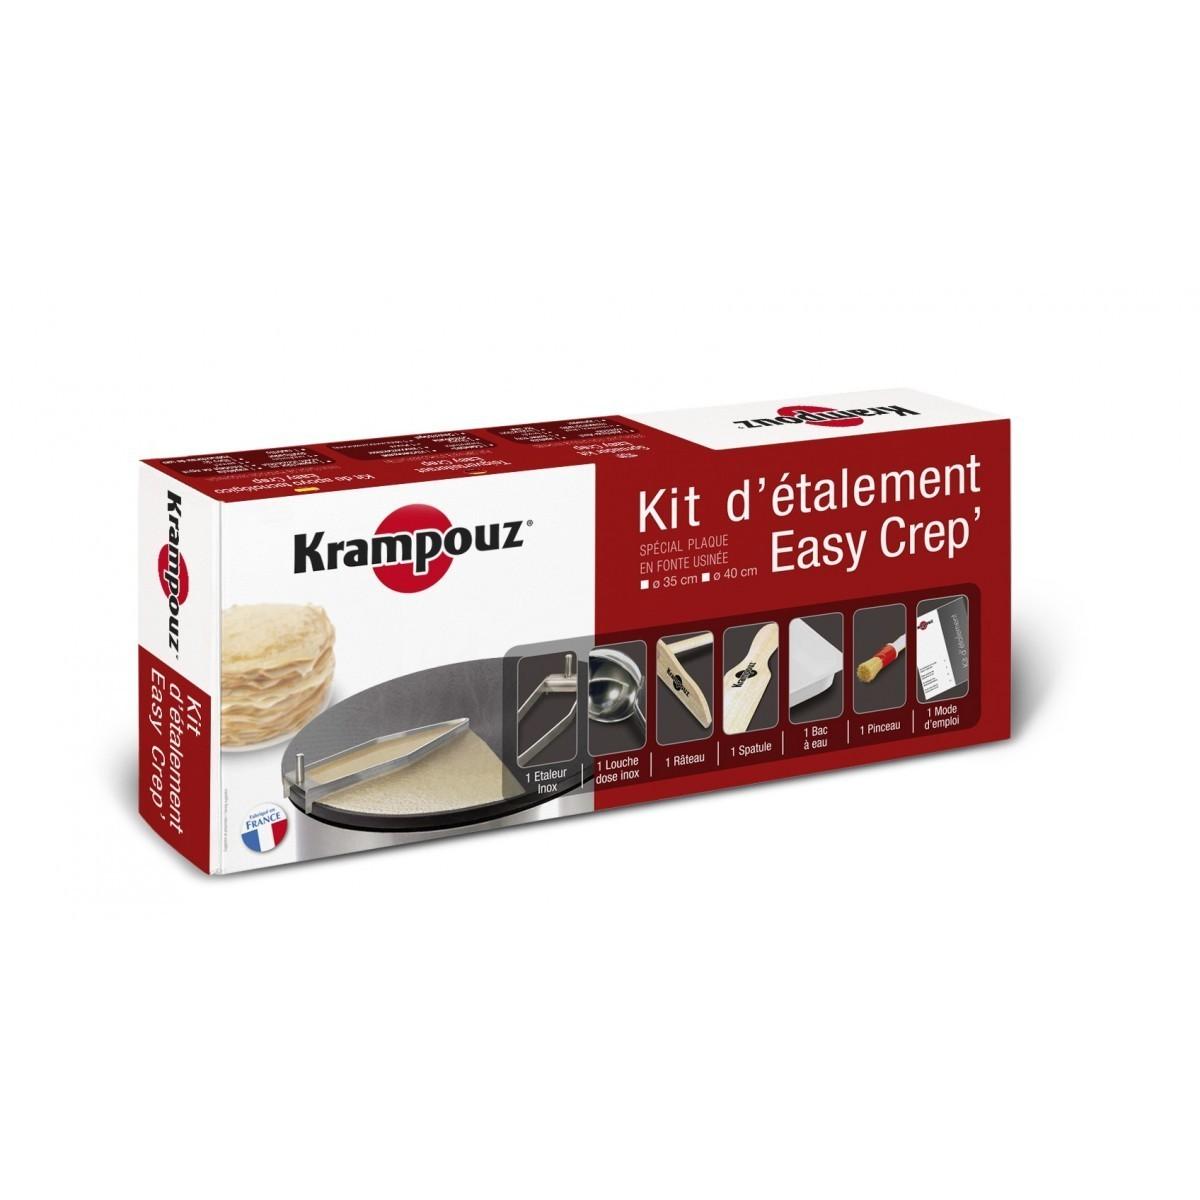 Krampouz, Crepe Makers Accessories, Batter Spreader Kits, Ø35cm